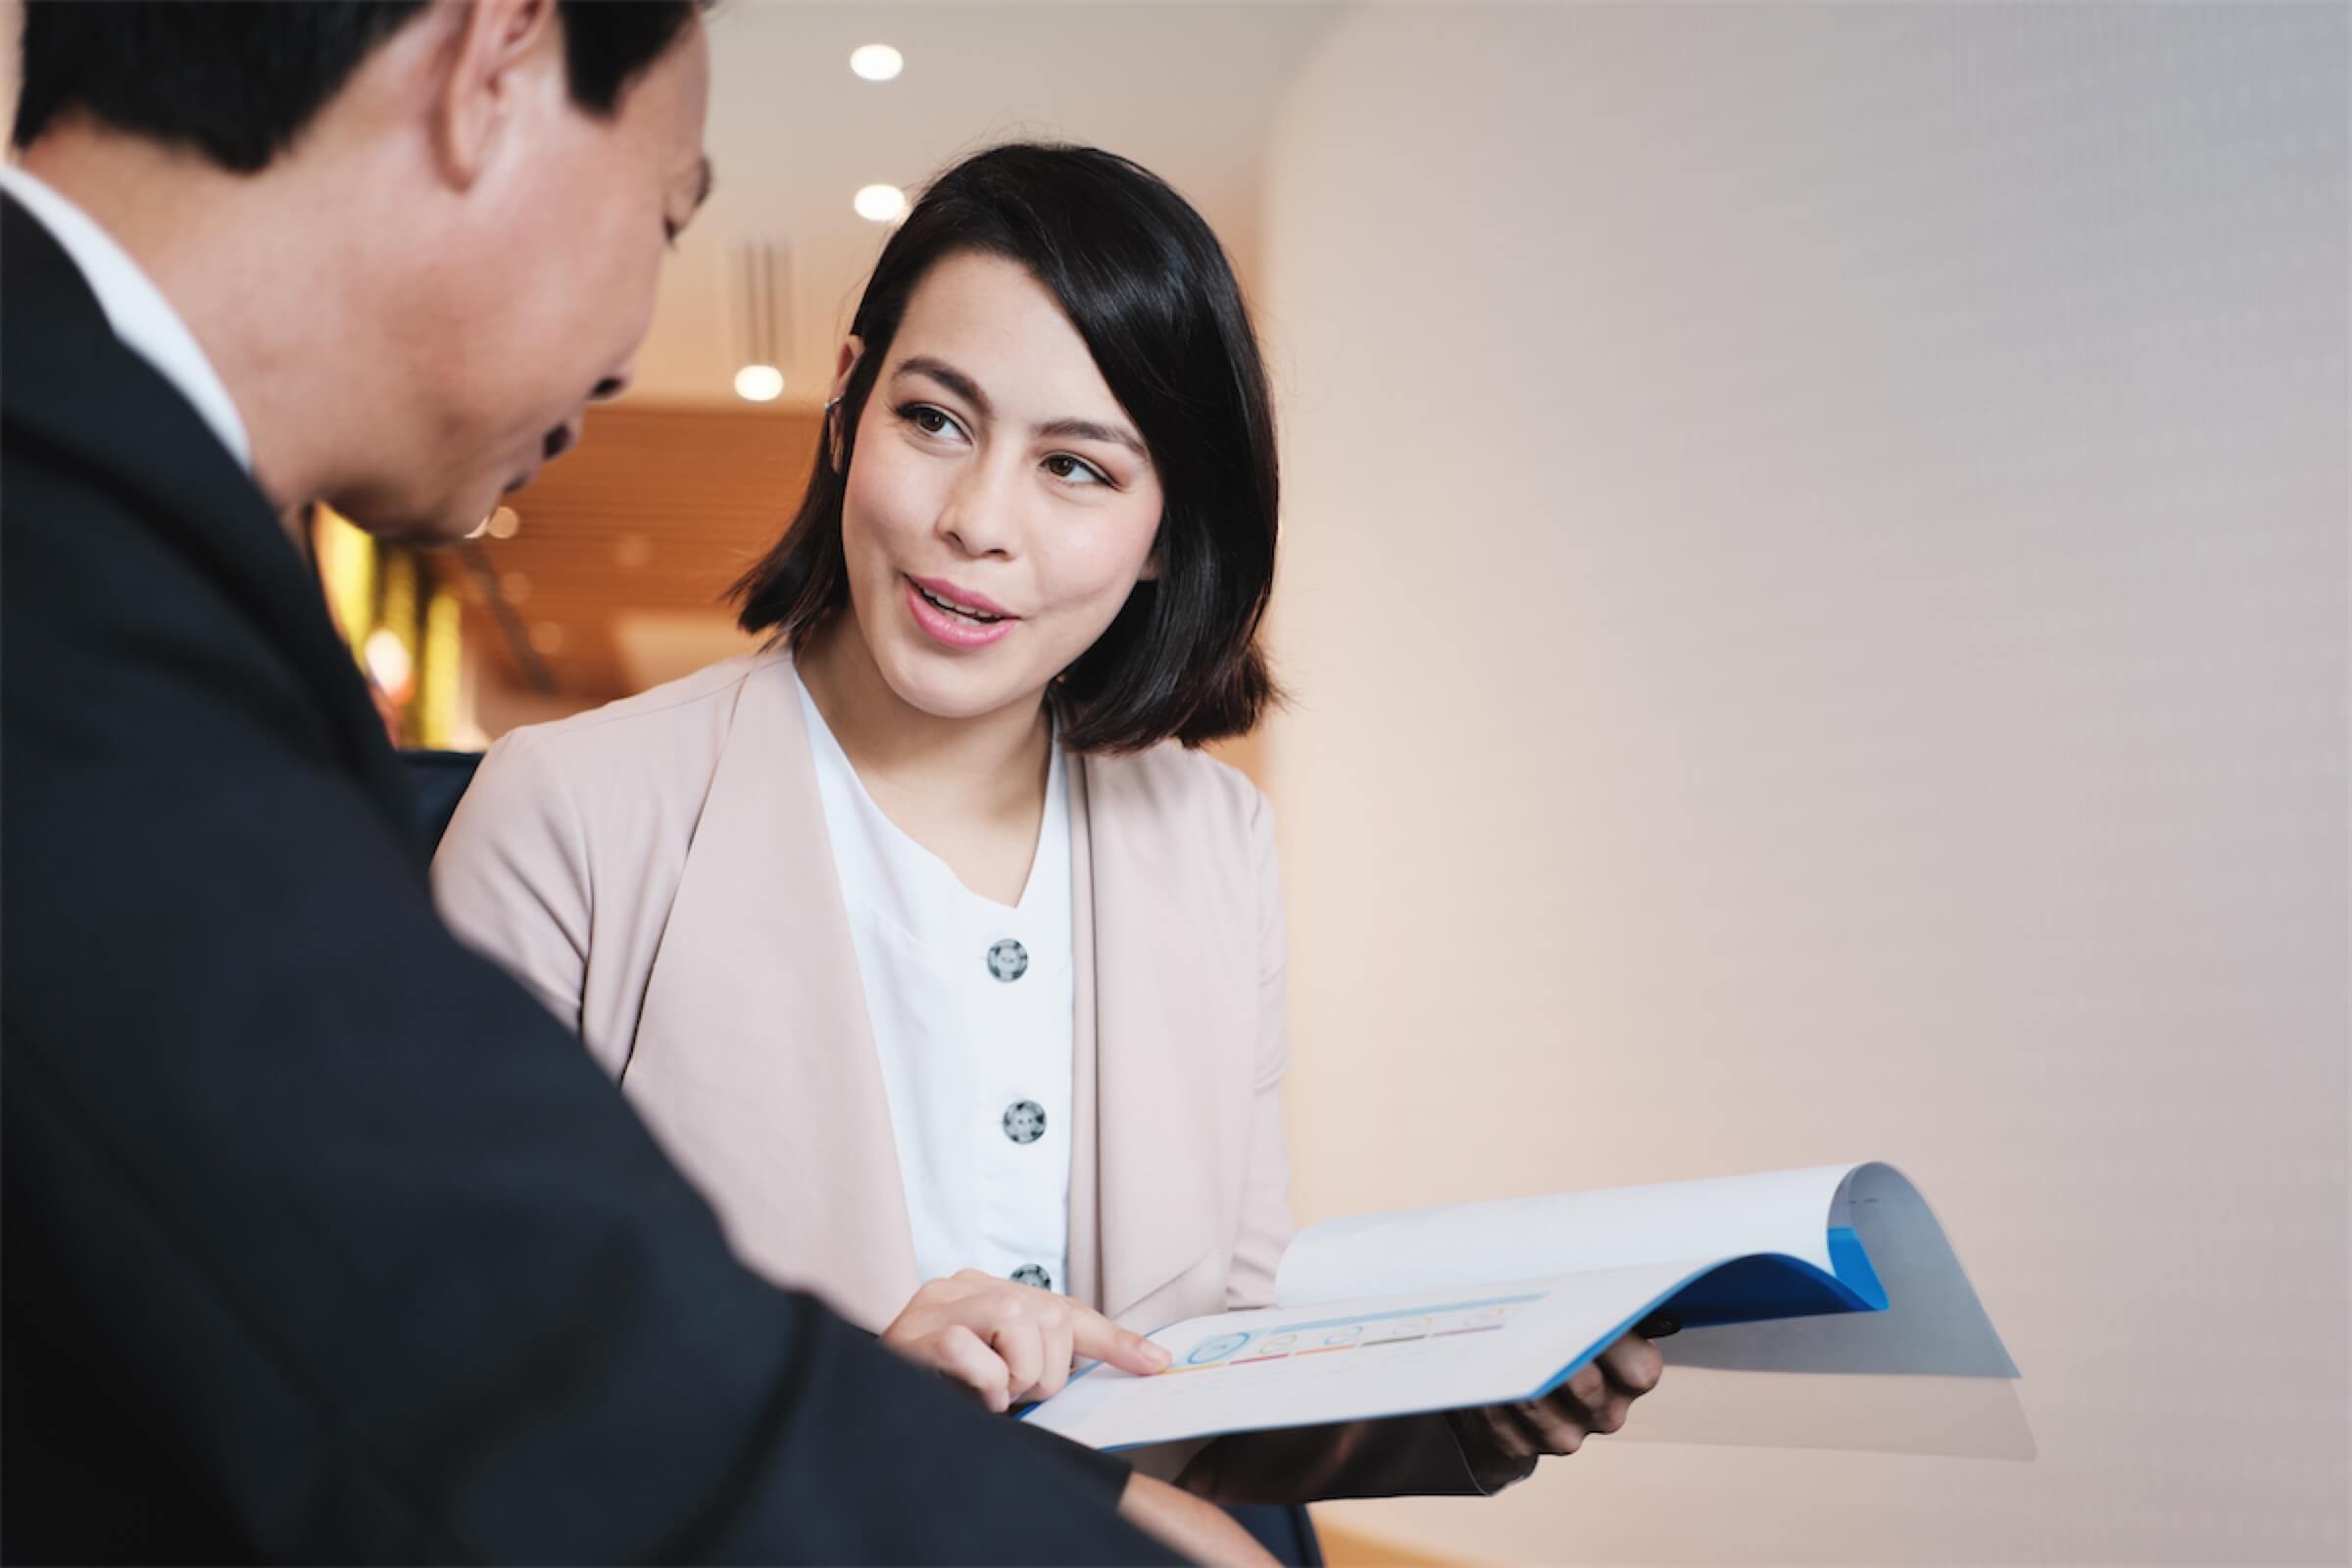 Introducing Private Loan Singapore Brokers